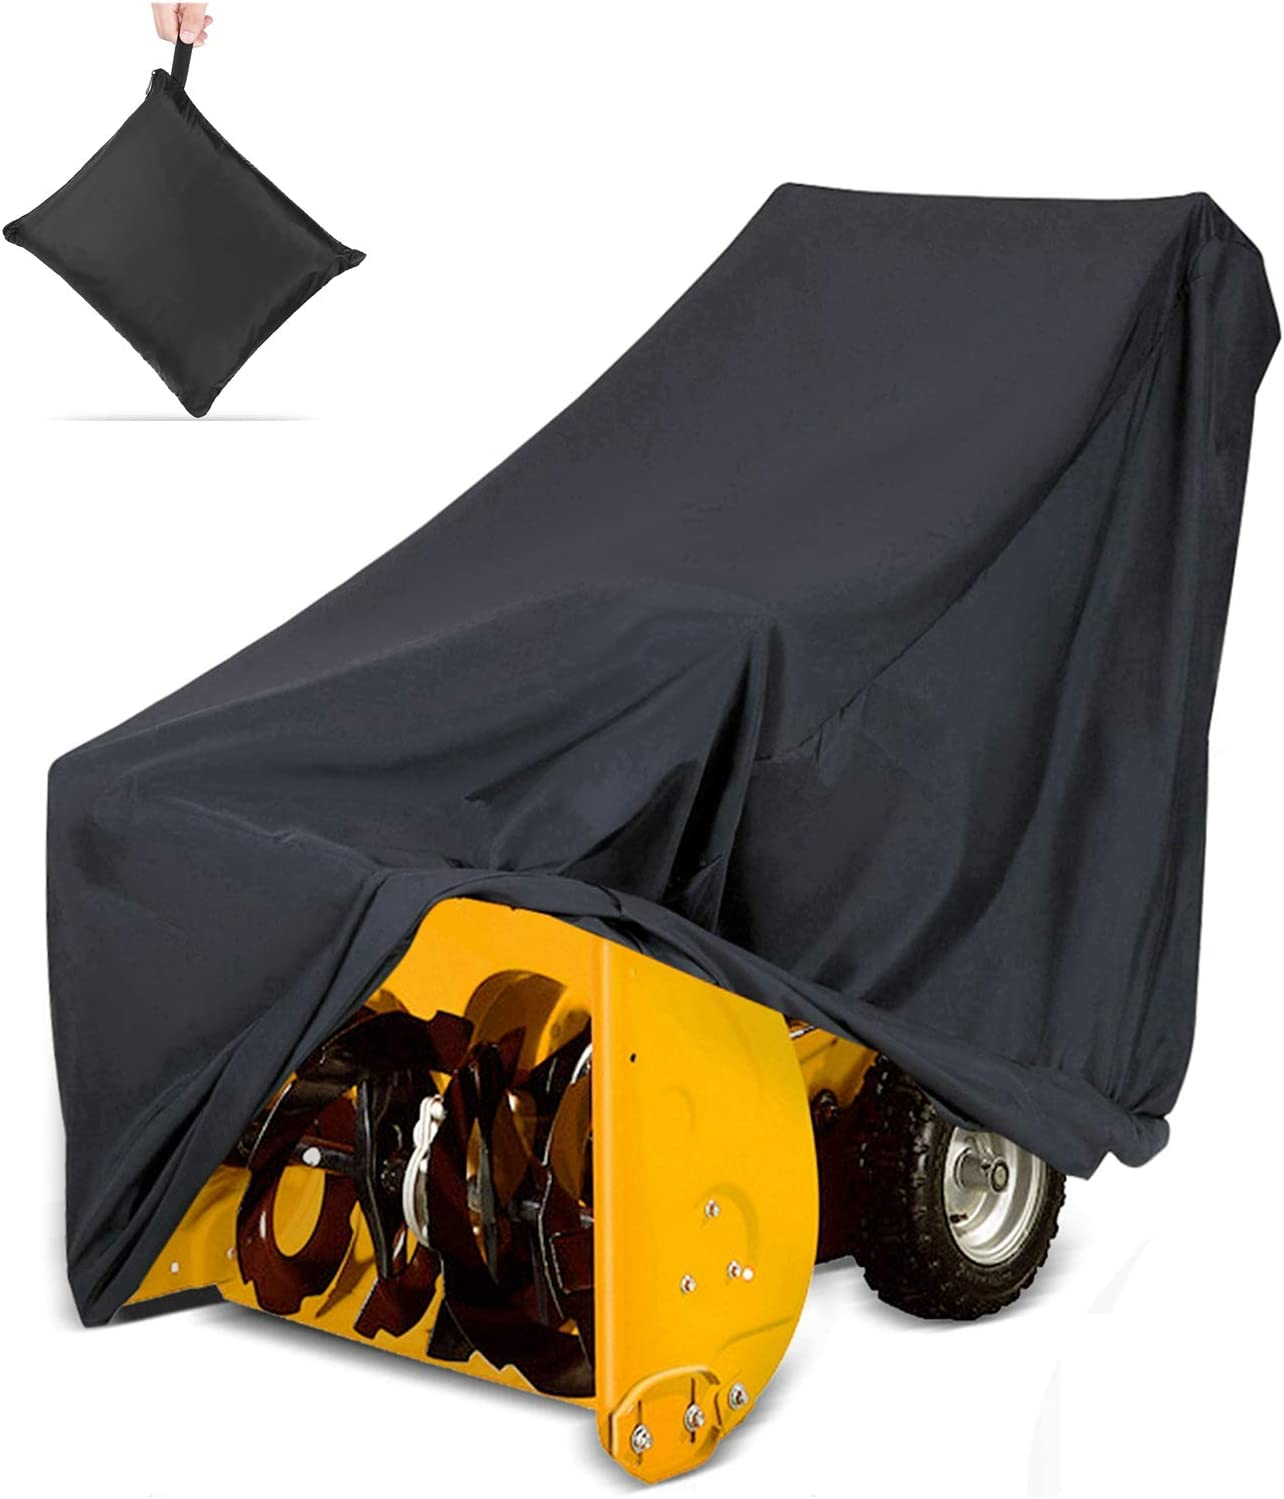 Heavy Duty Snow Thrower Snowblower Storage Protective Cover Anti-UV Waterproof